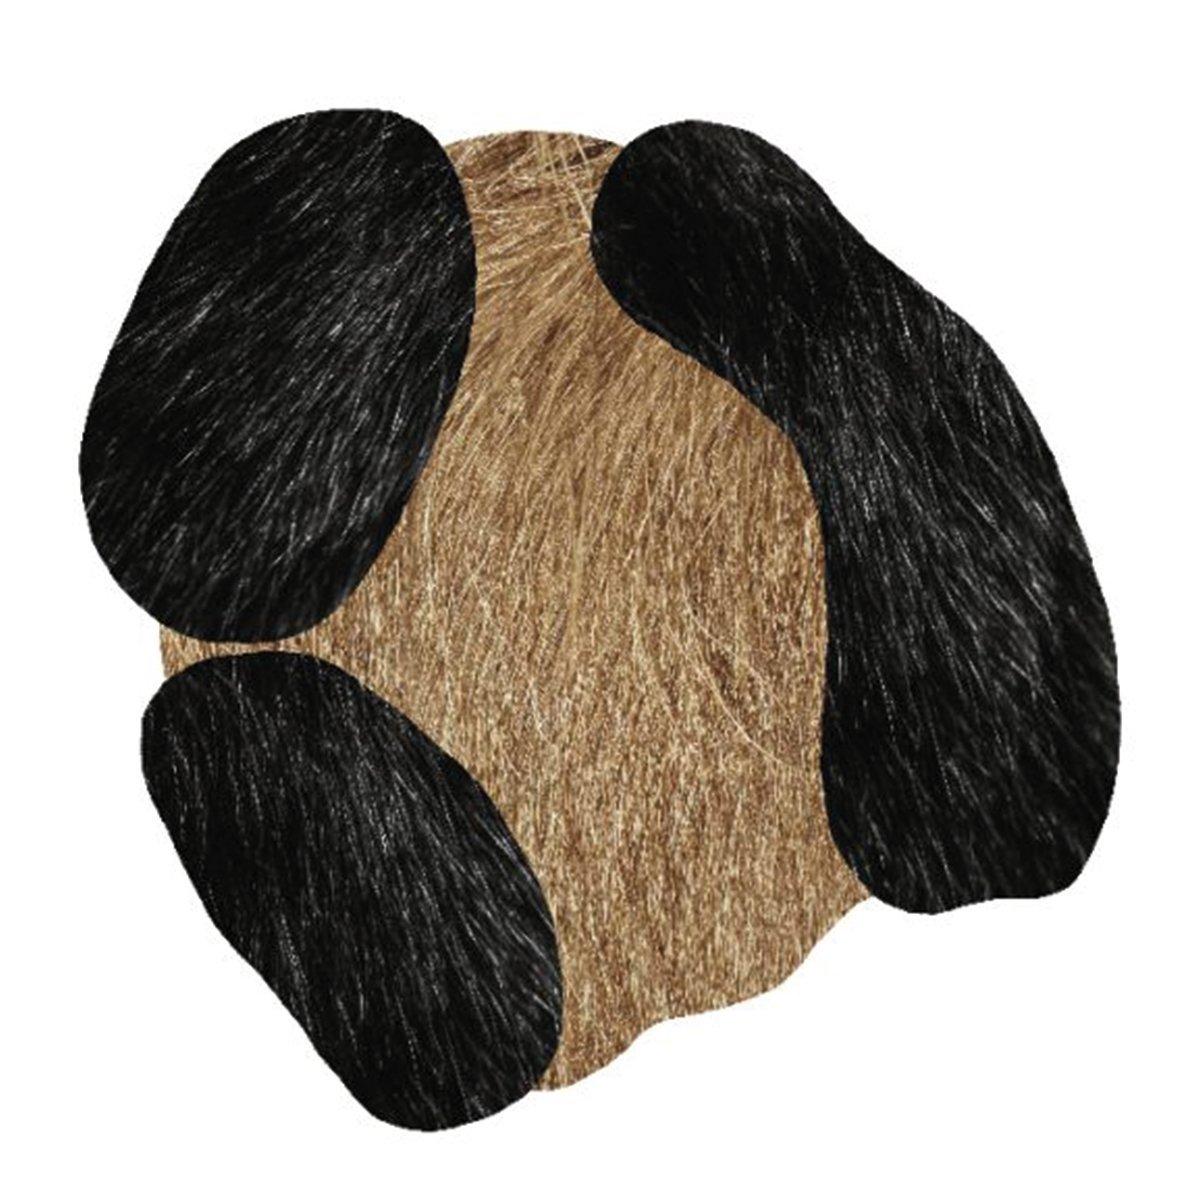 Moooi Carpets - Bearded Leopard Vloerkleed - 150 x 147 cm. - Low Pile